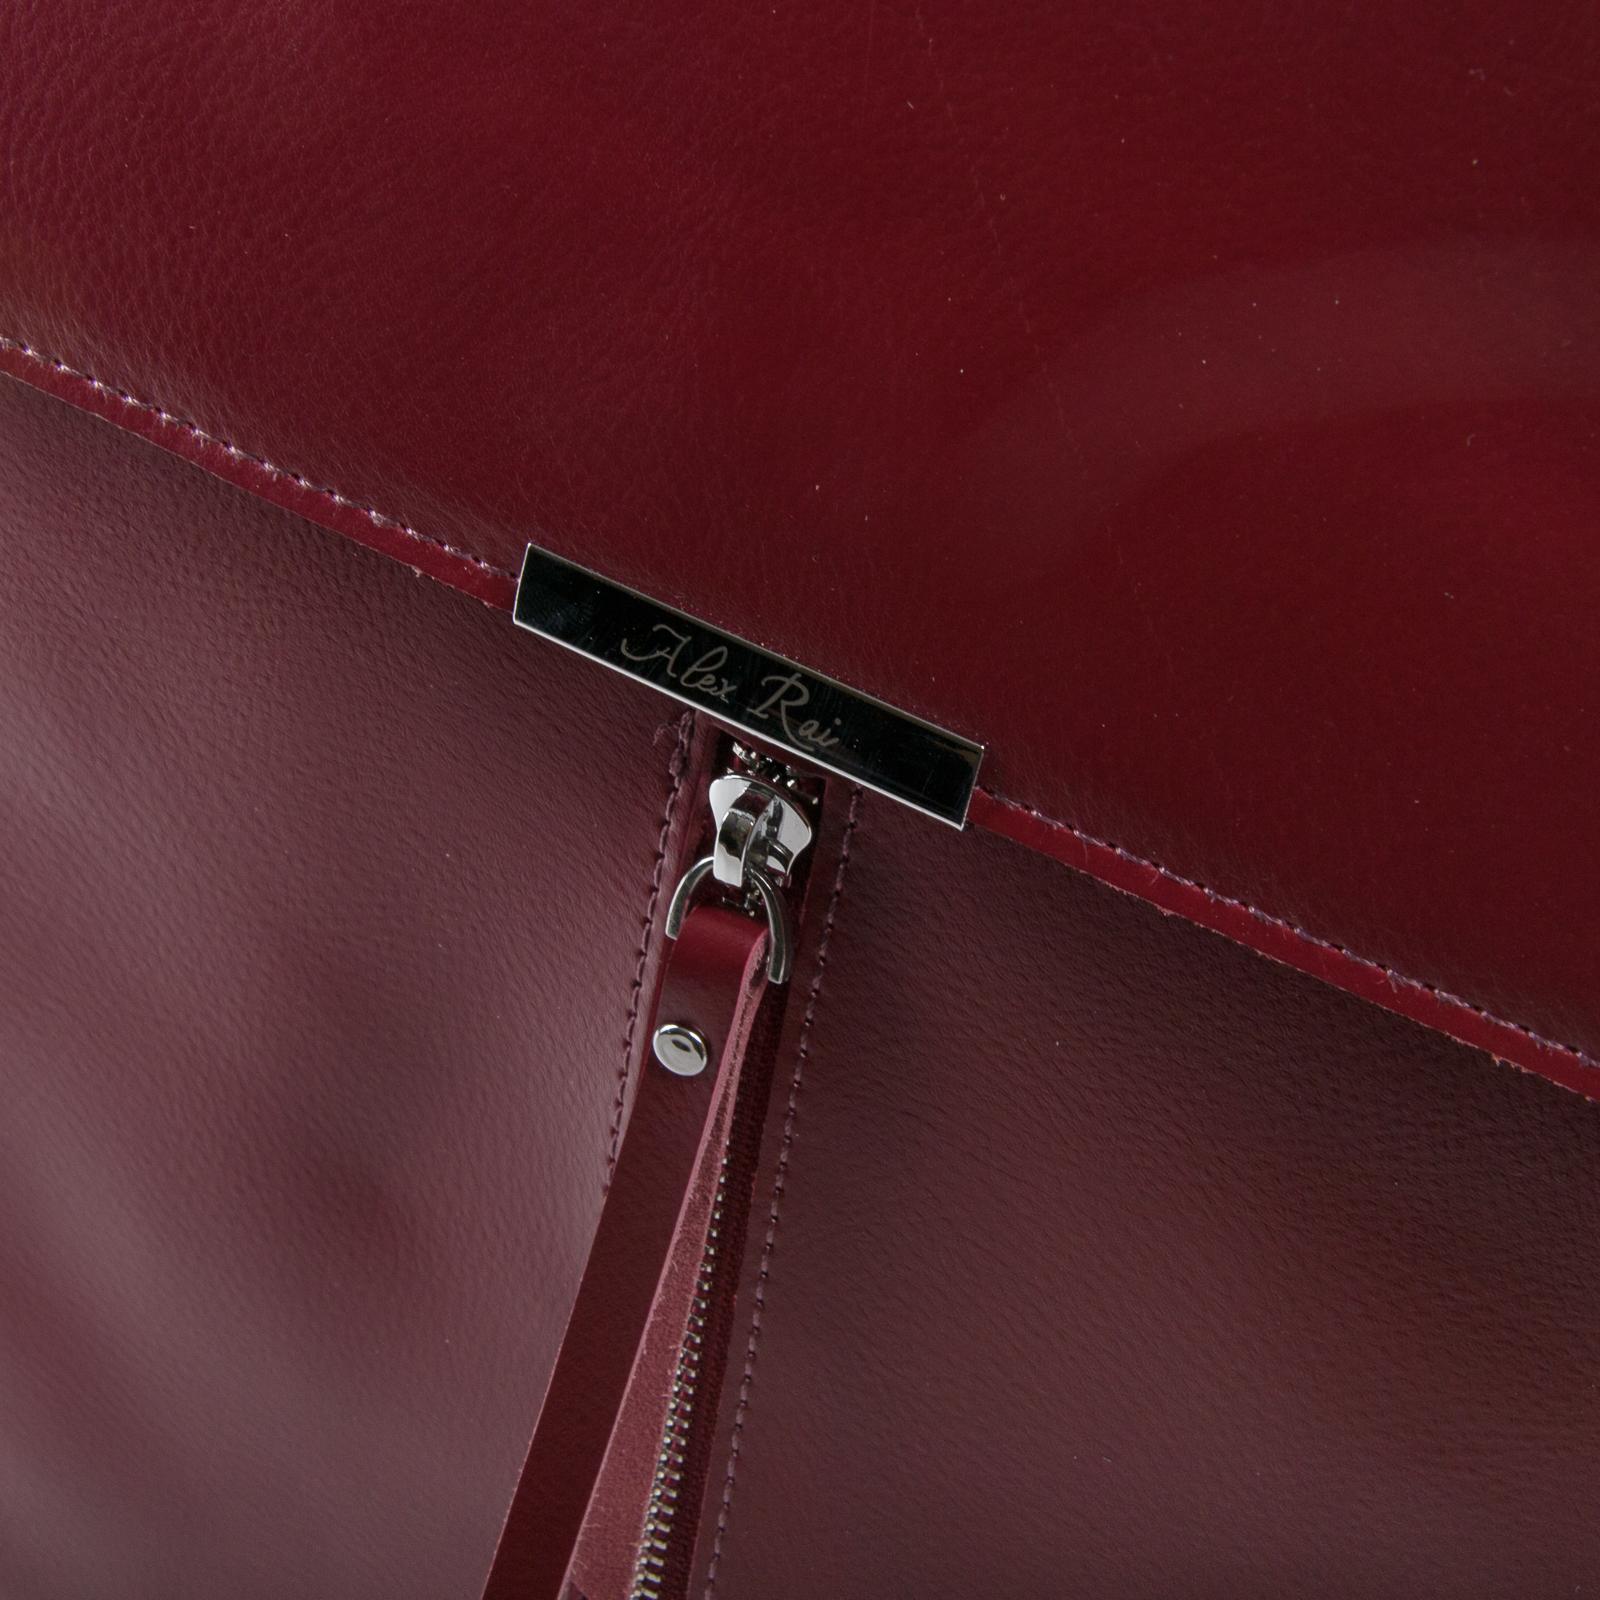 Сумка Женская Рюкзак кожа ALEX RAI 03-01 373 light-red - фото 3